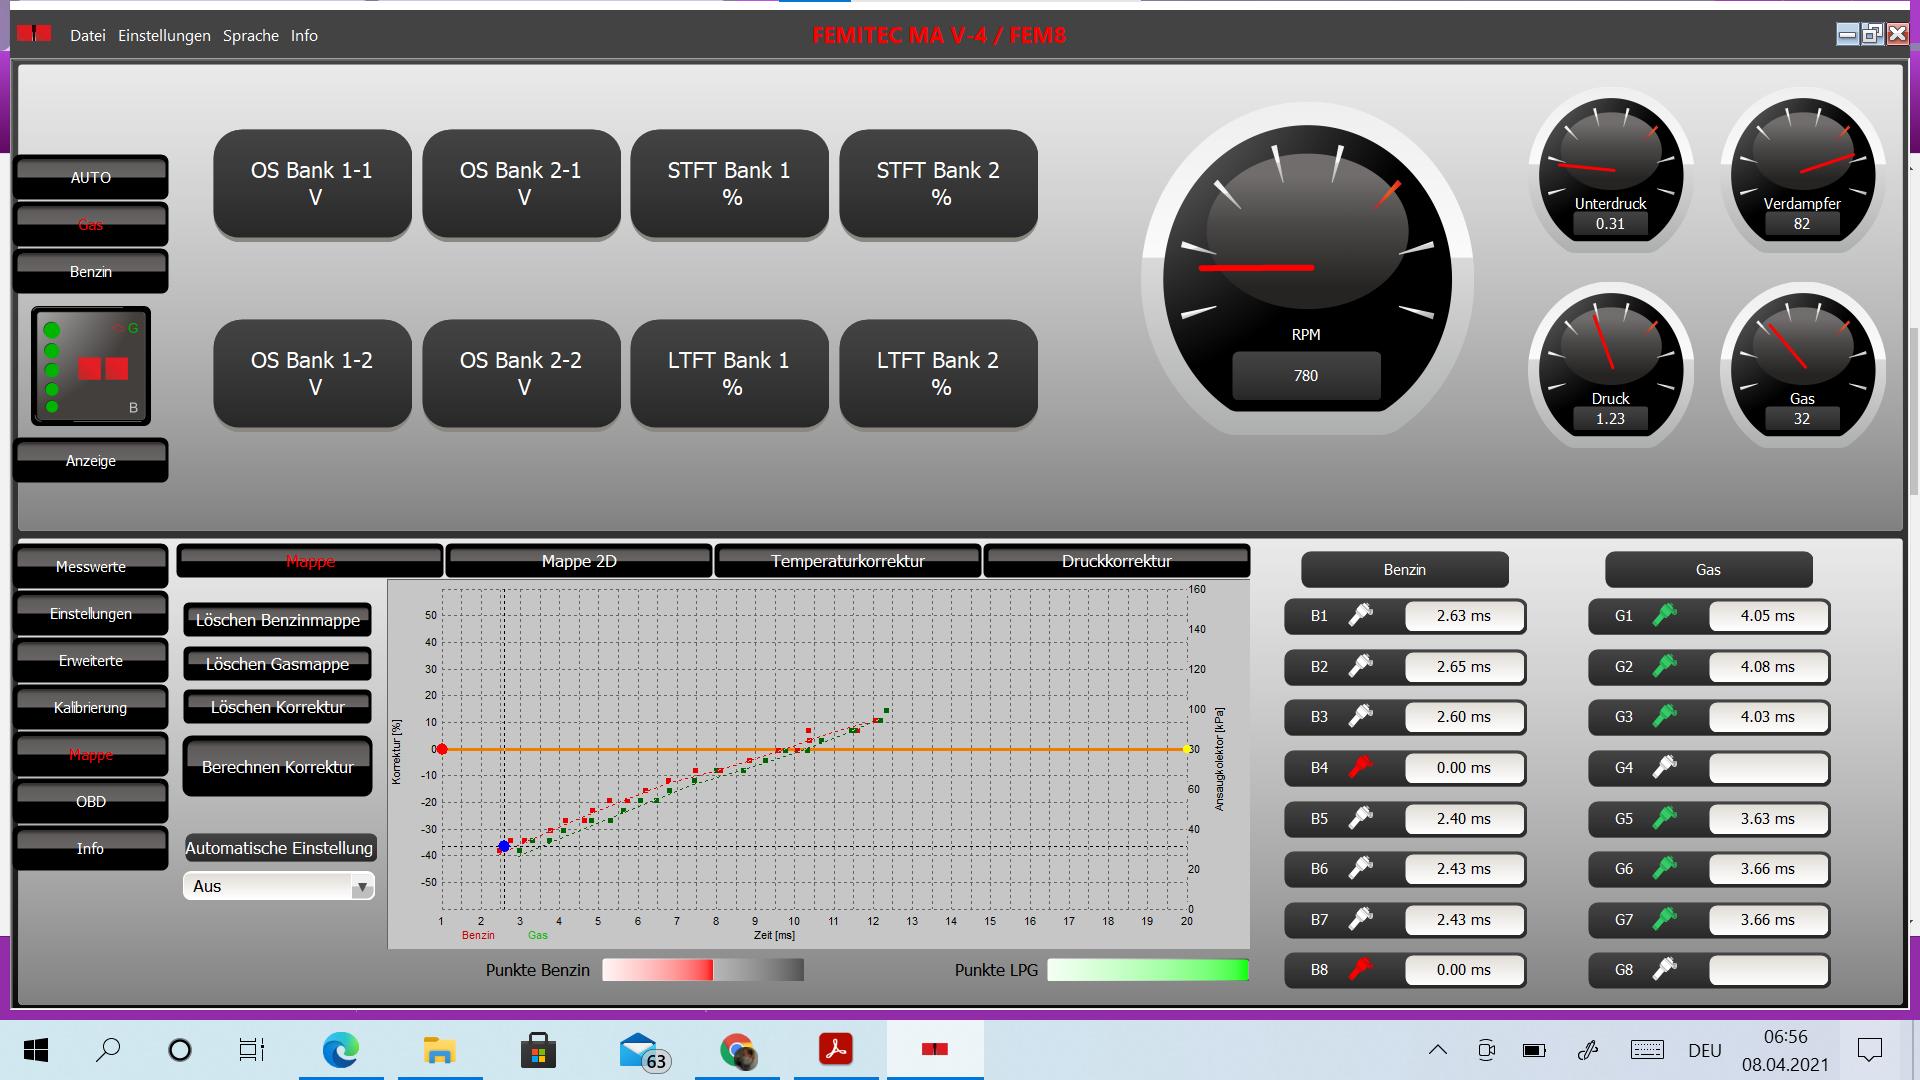 Screenshot 2021-04-08 080752.png